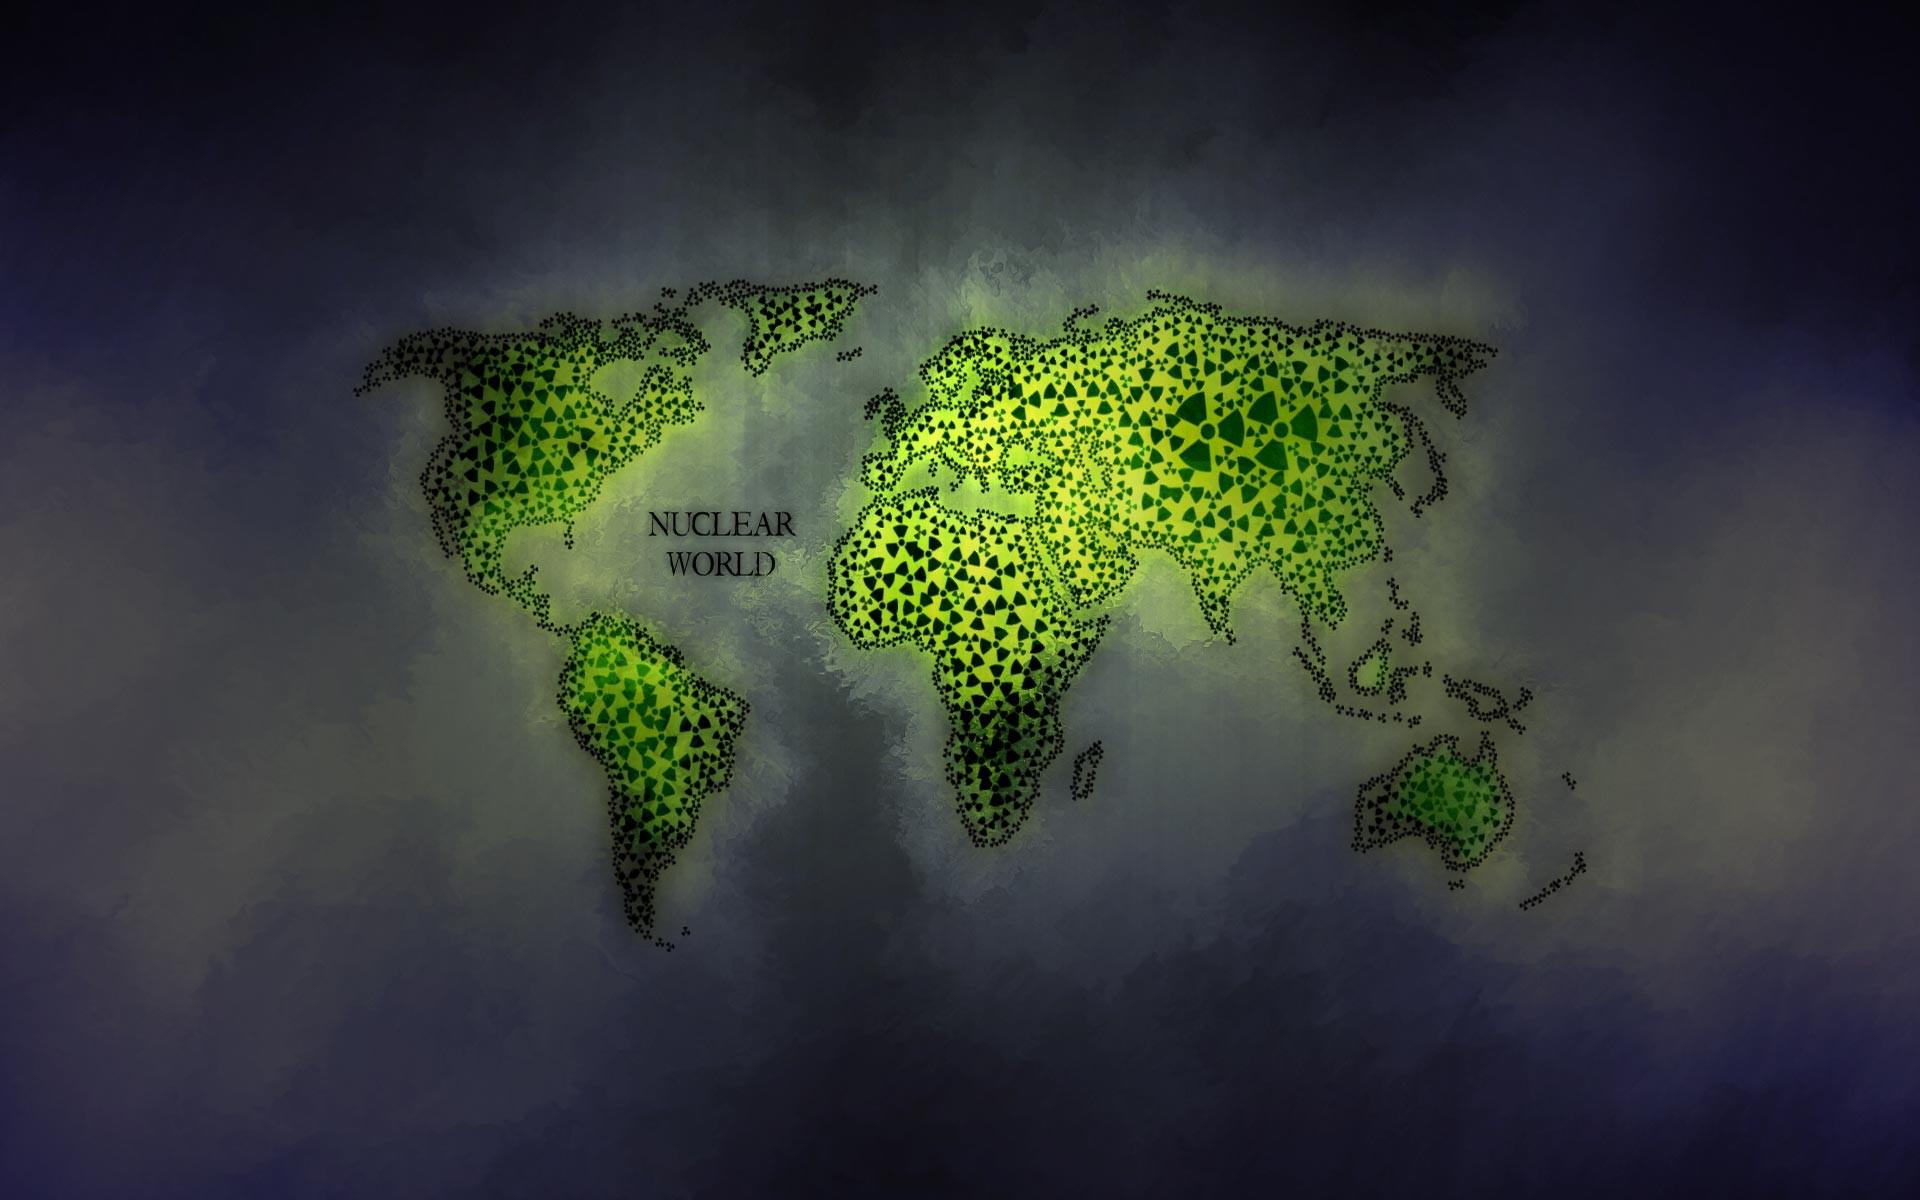 nuclear world computer wallpapers desktop backgrounds